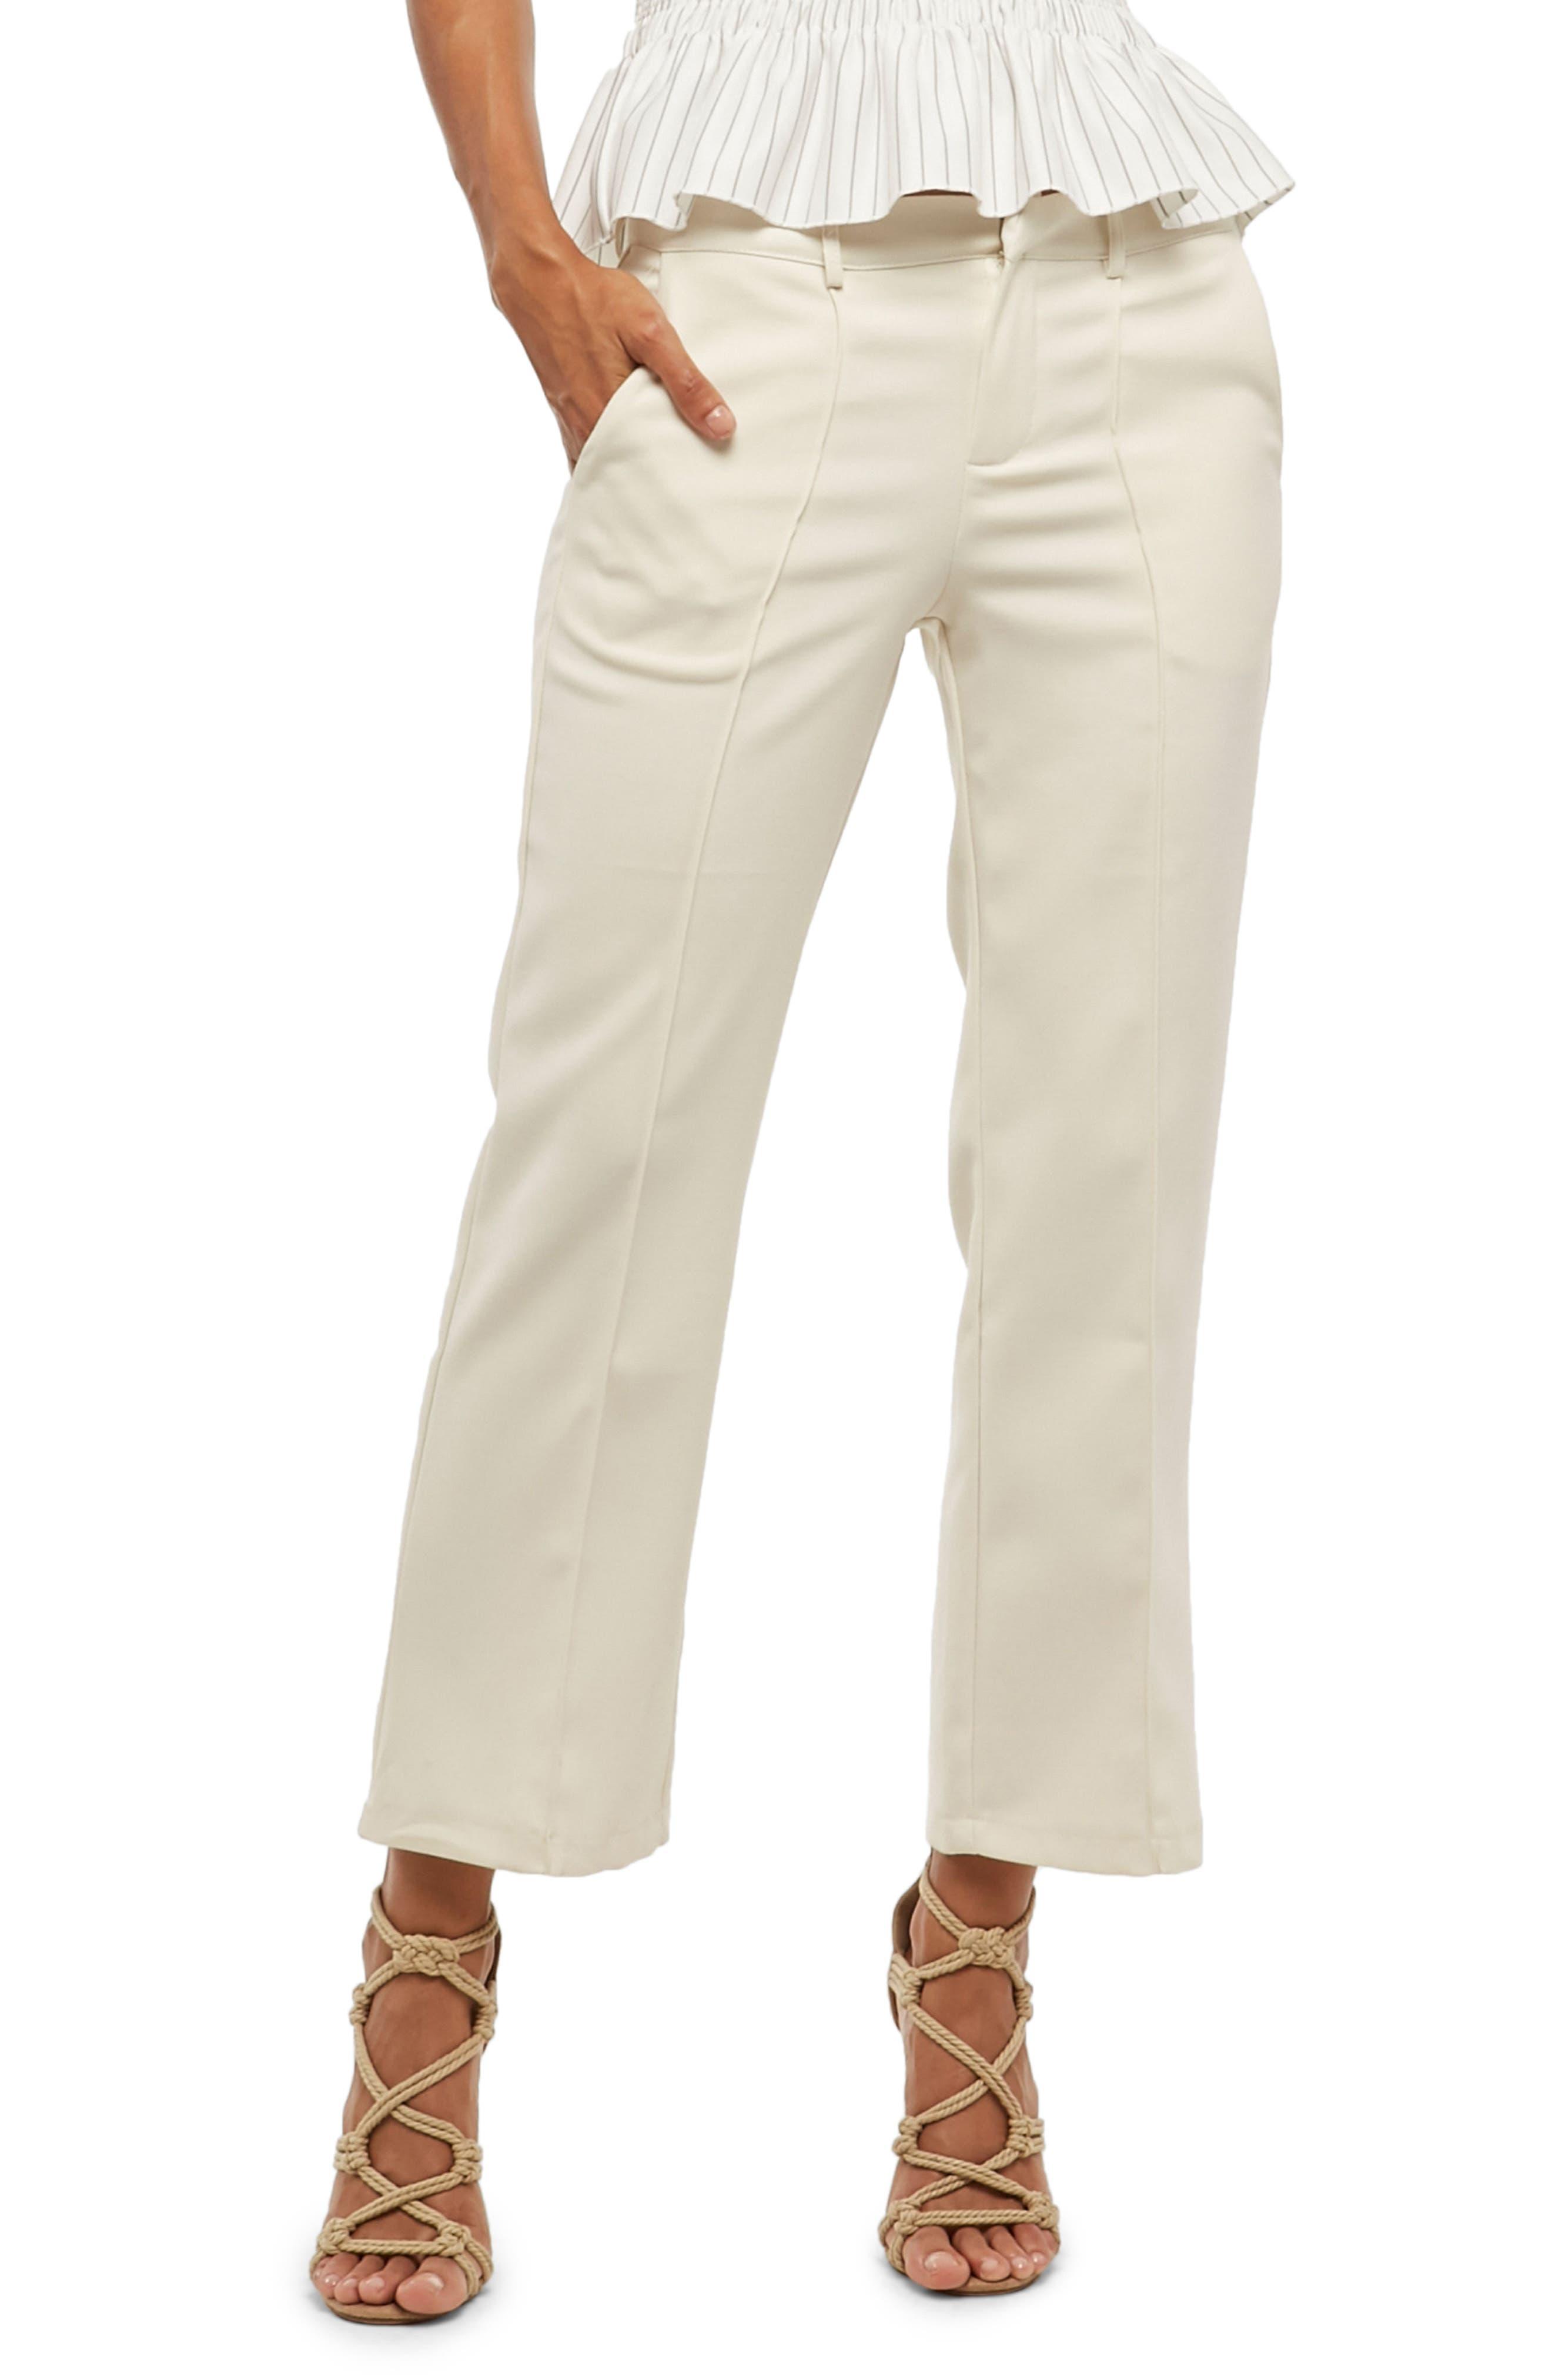 Alpha & Omega Pintuck Pants